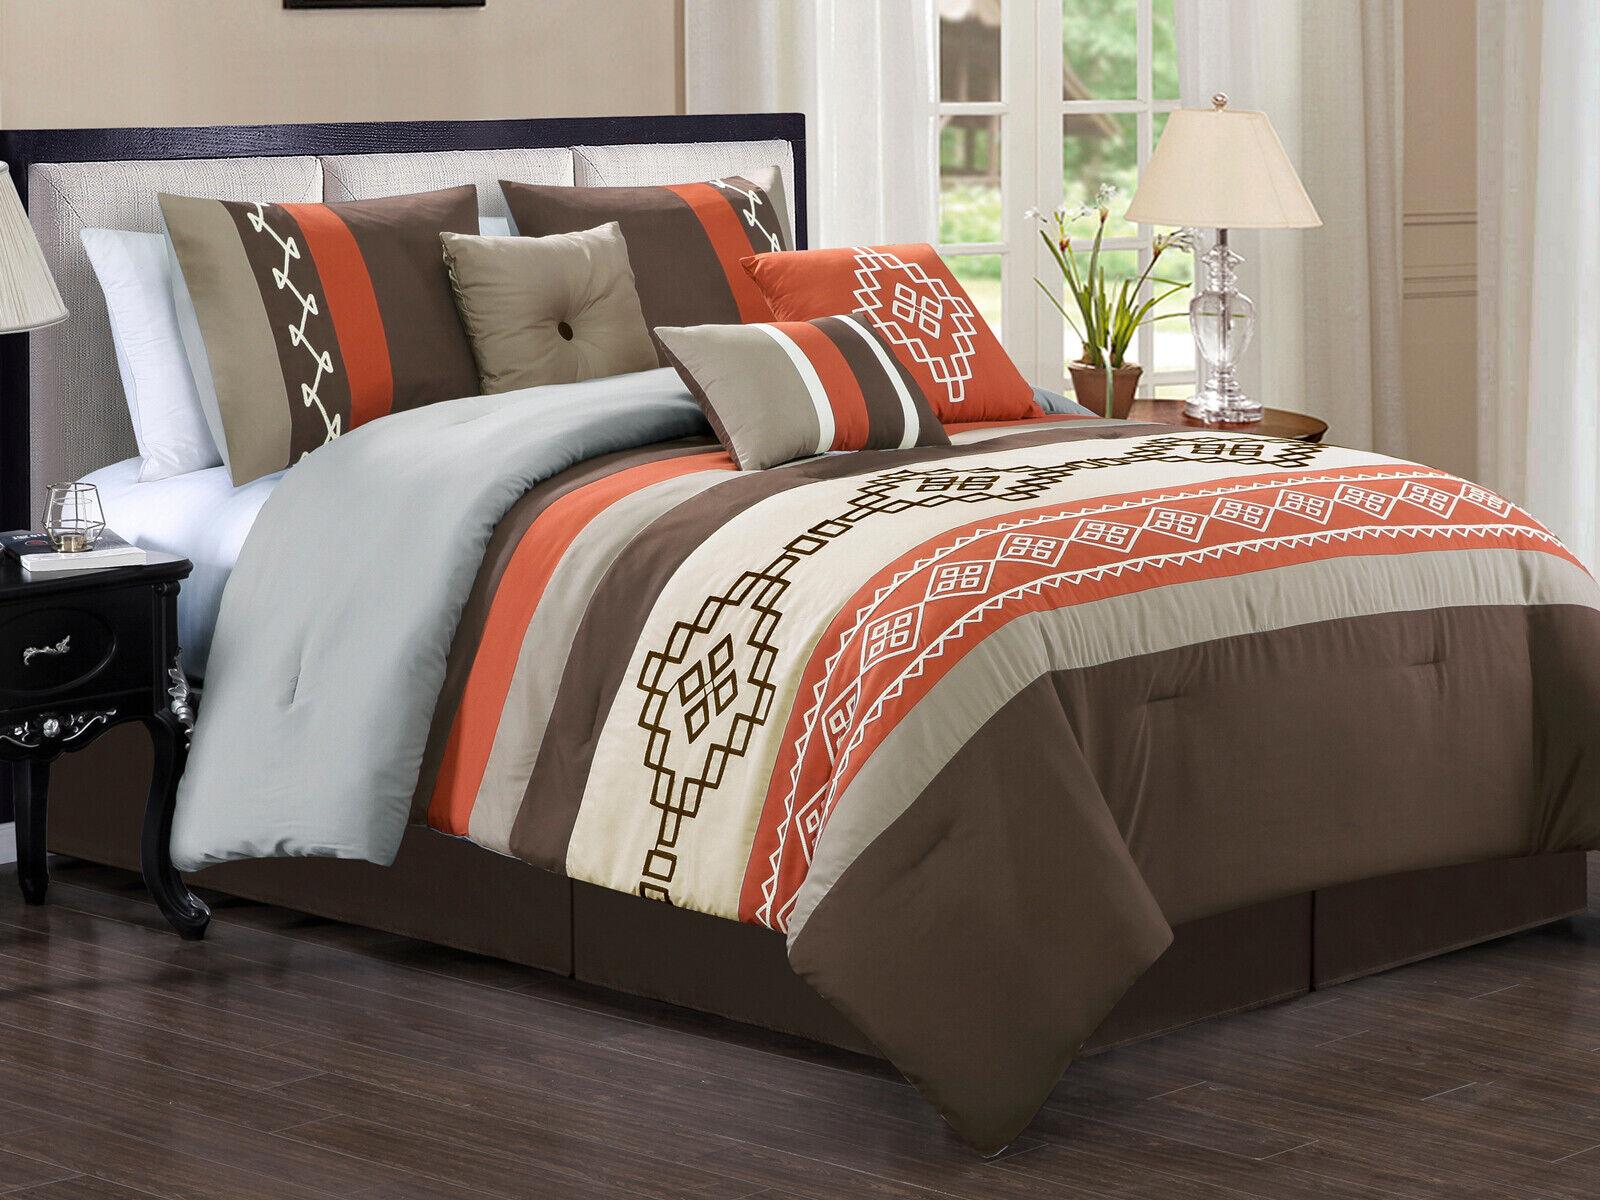 11-Pc Makawee Southwest Rectangle Comforter Curtain Set Taupe Rust braun King